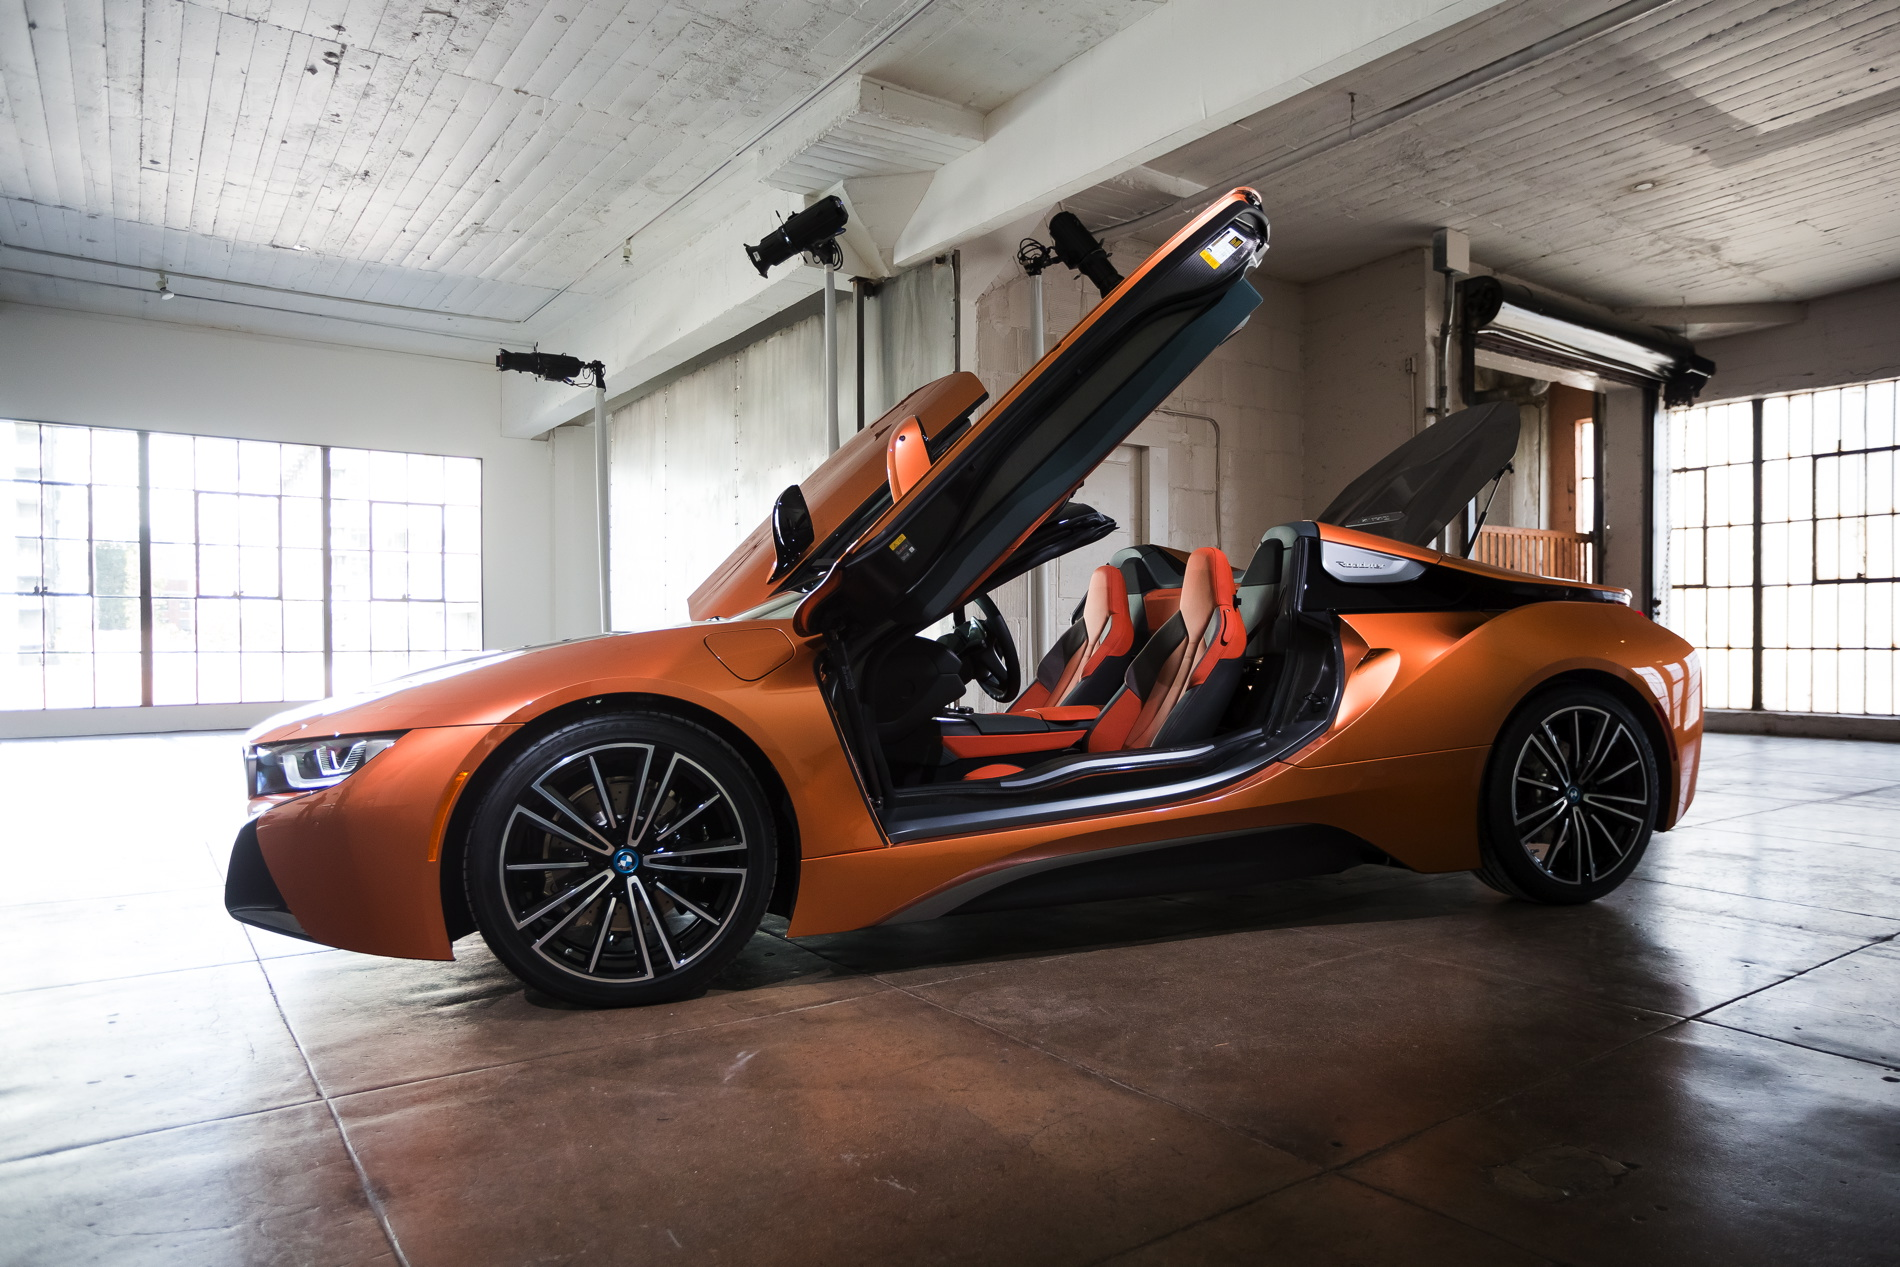 2018-BMW-i8-Roadster-29.jpg